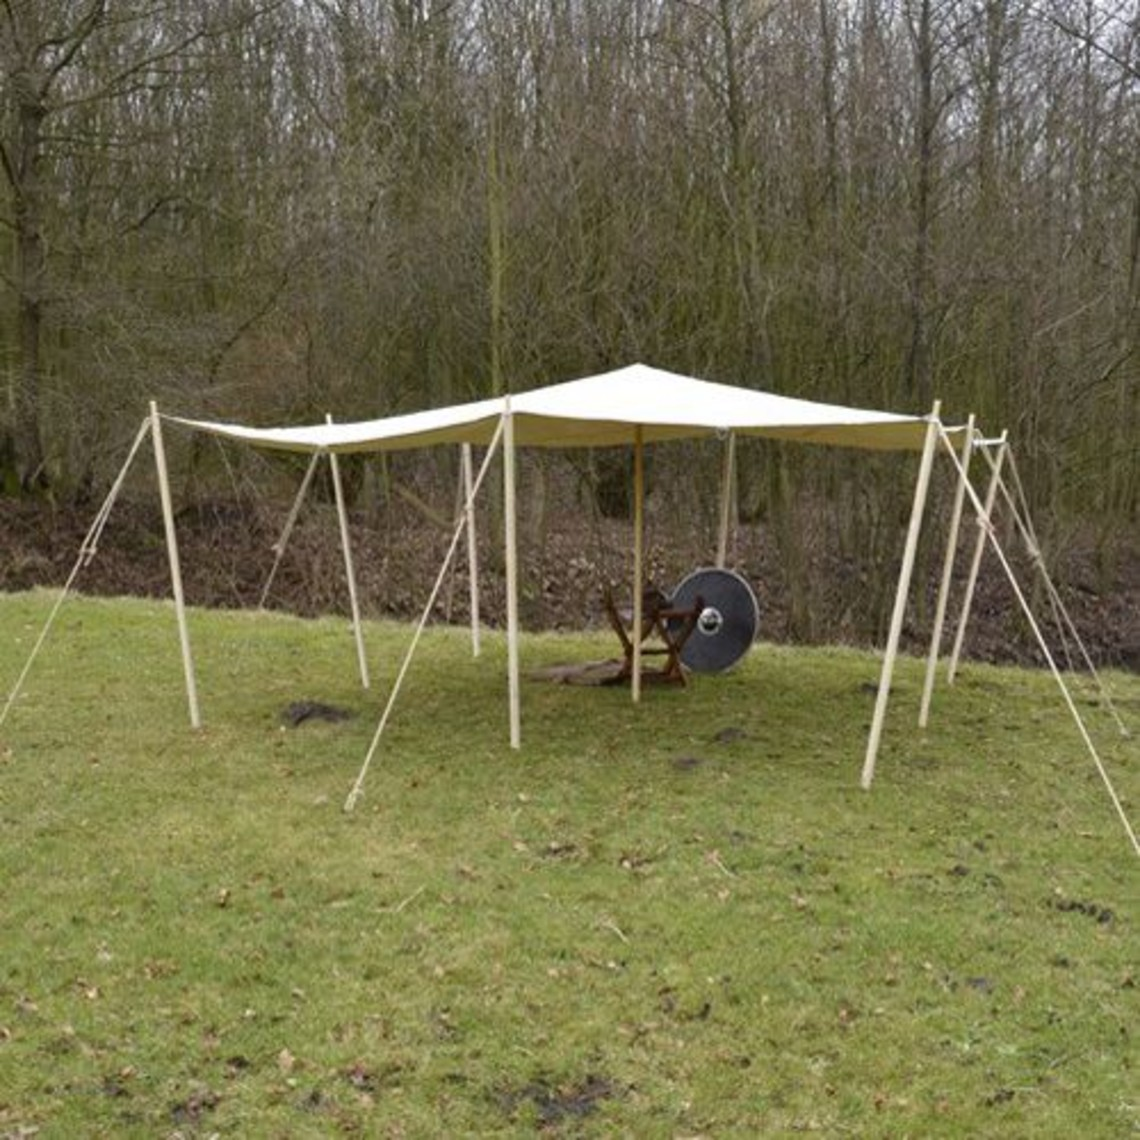 Abdeckplane 3 x 5 m 350 g / m²